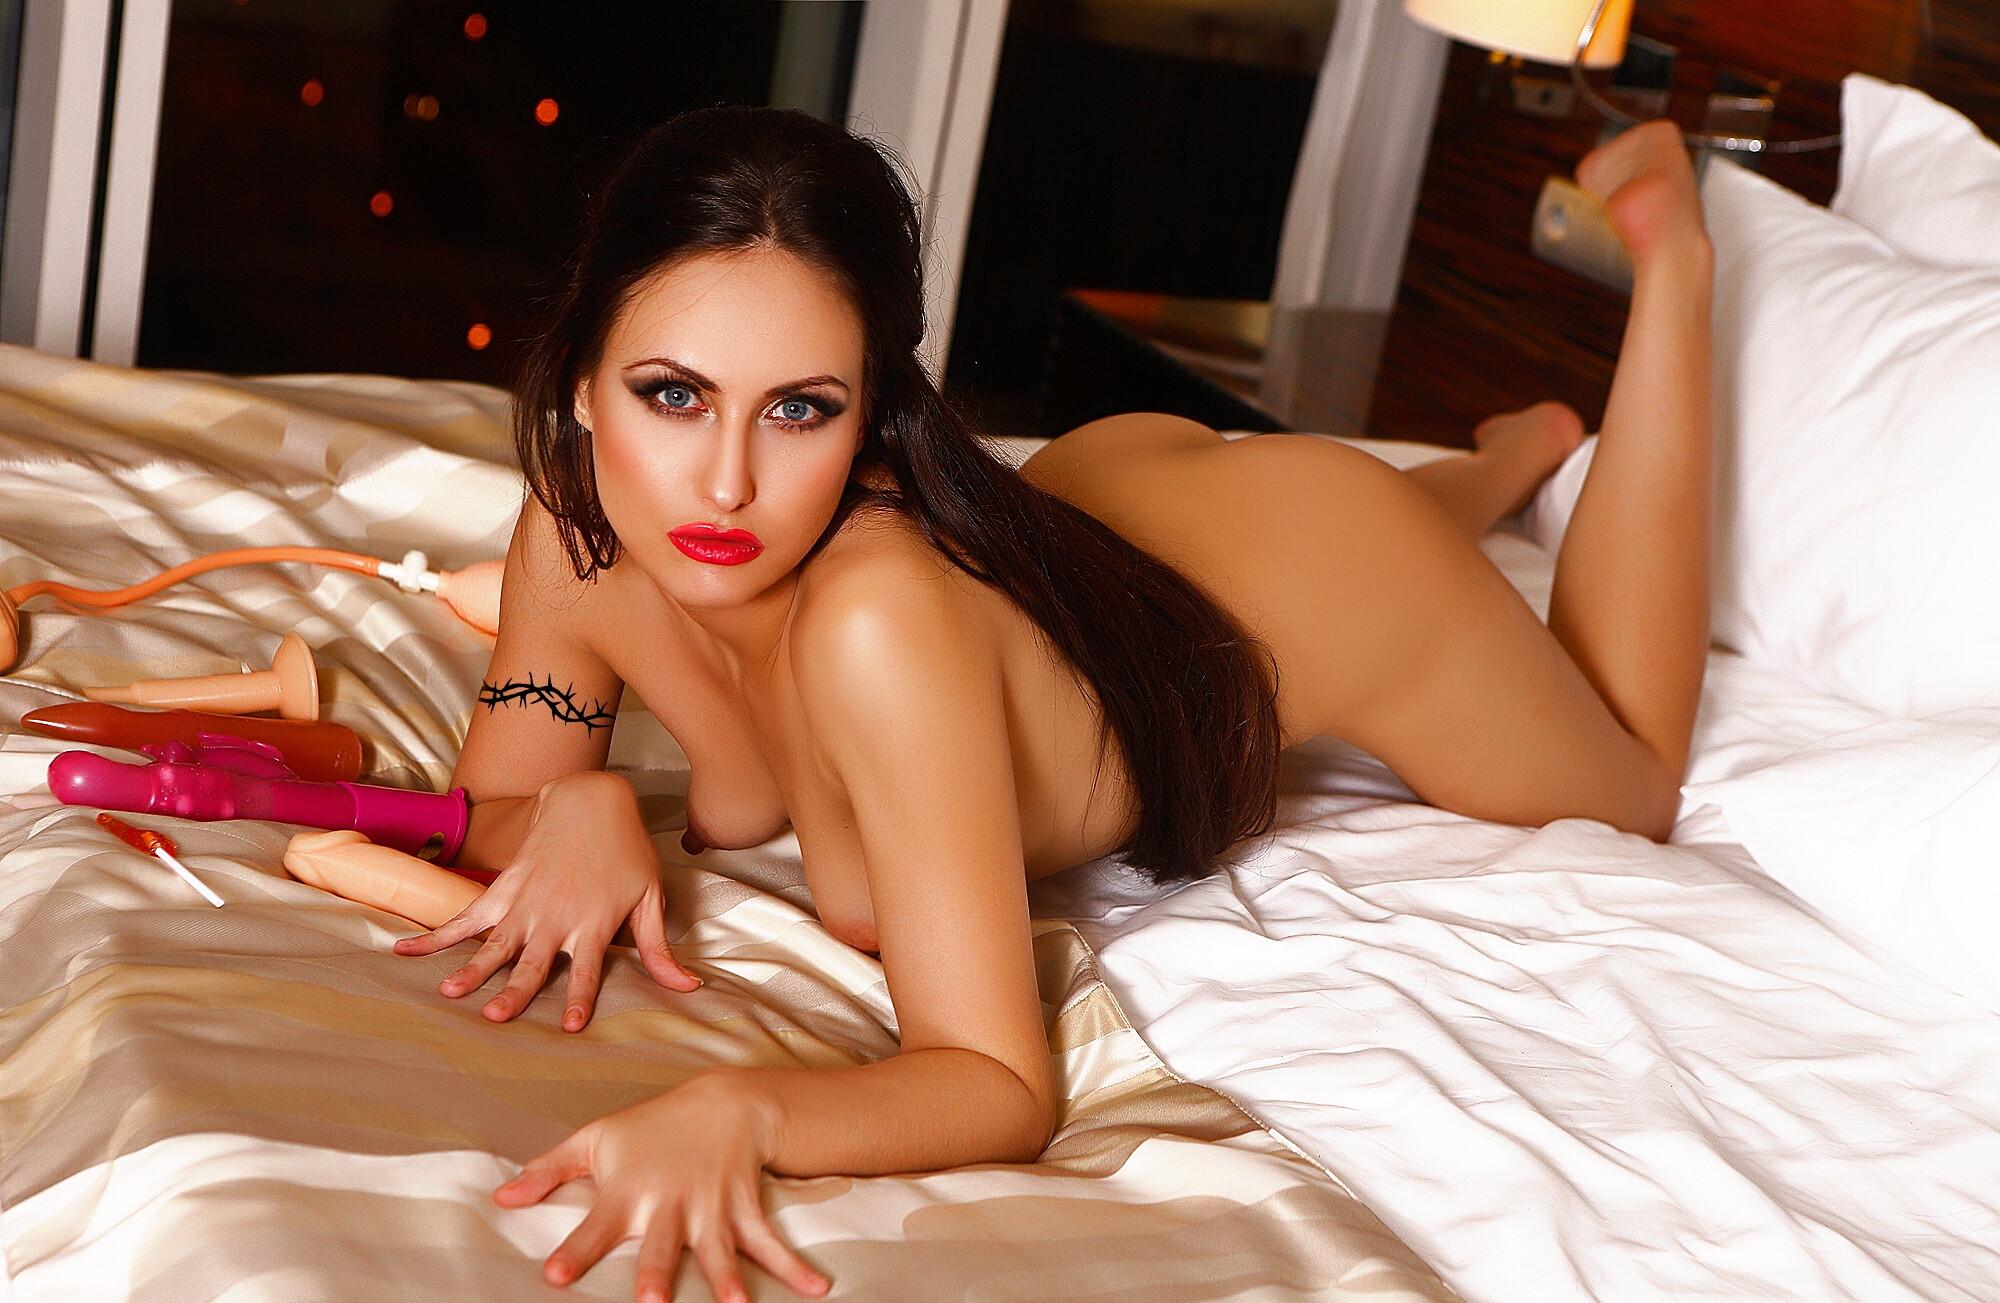 Проститутки екб 66 индивидуалка тюмень сити